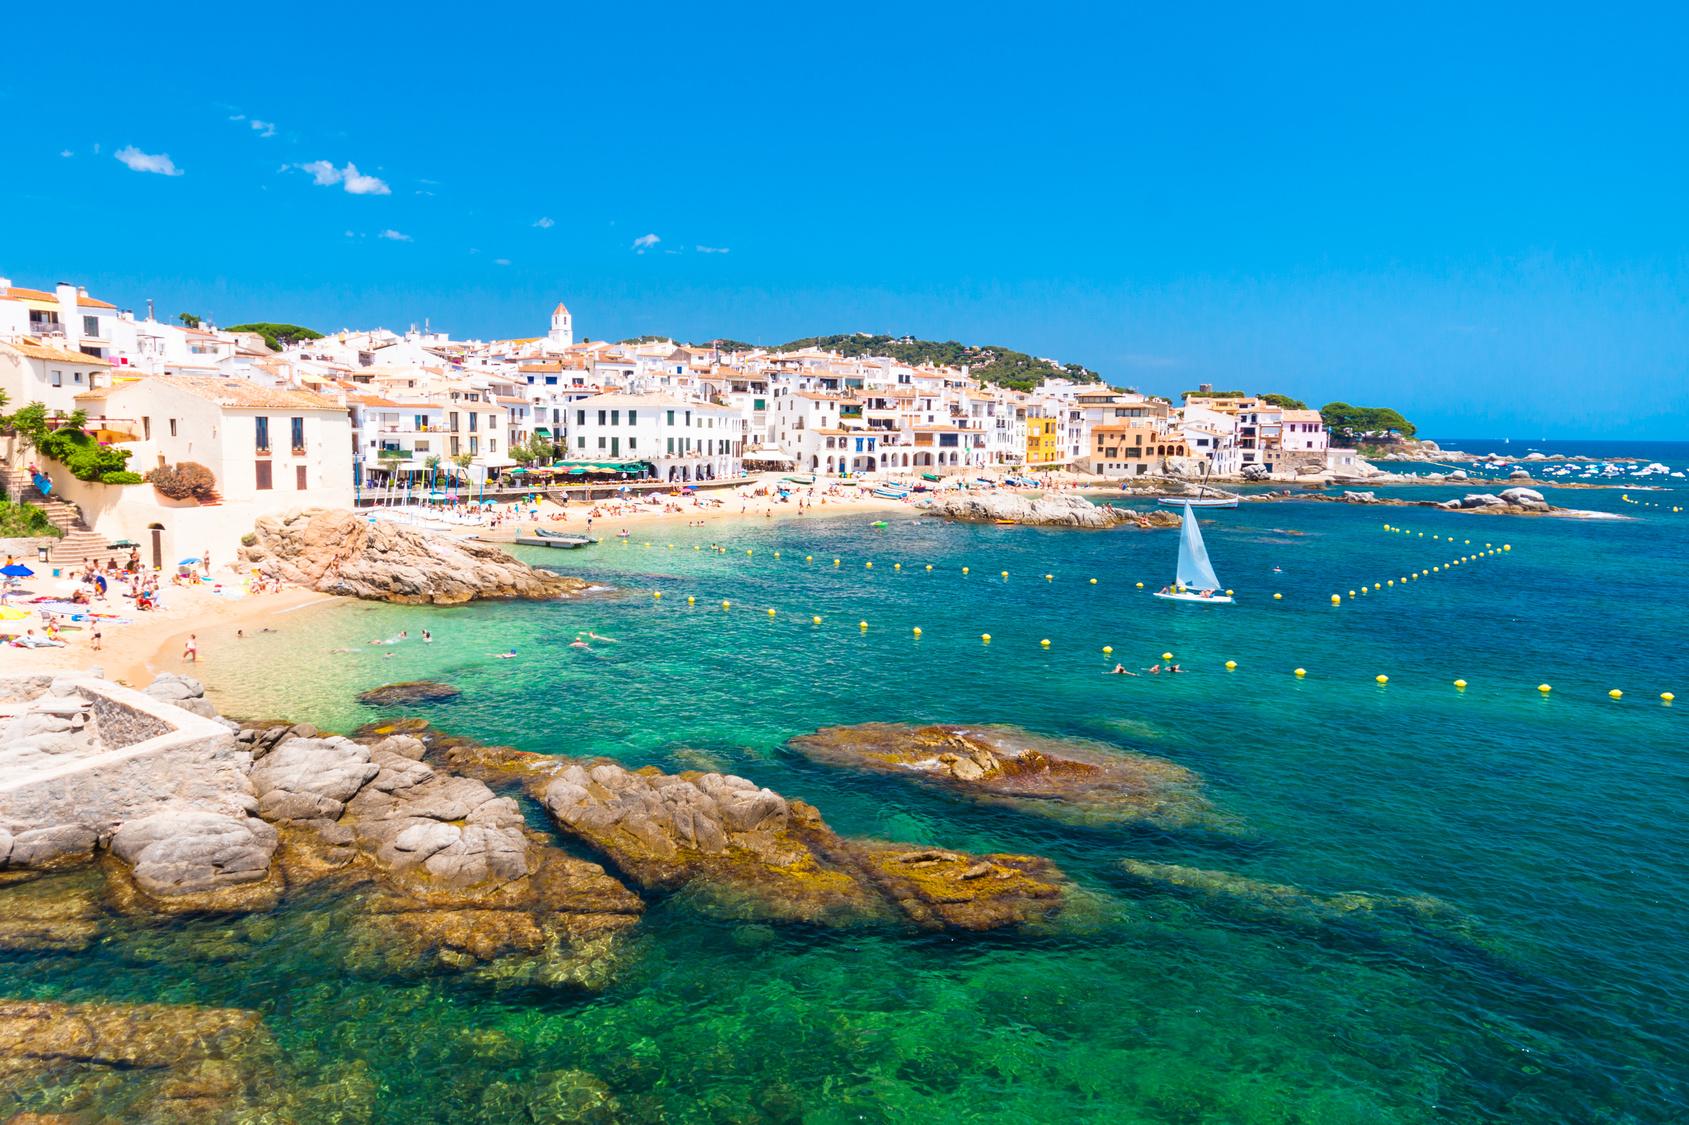 Sprawdź najlepsze hotele na Costa Brava!